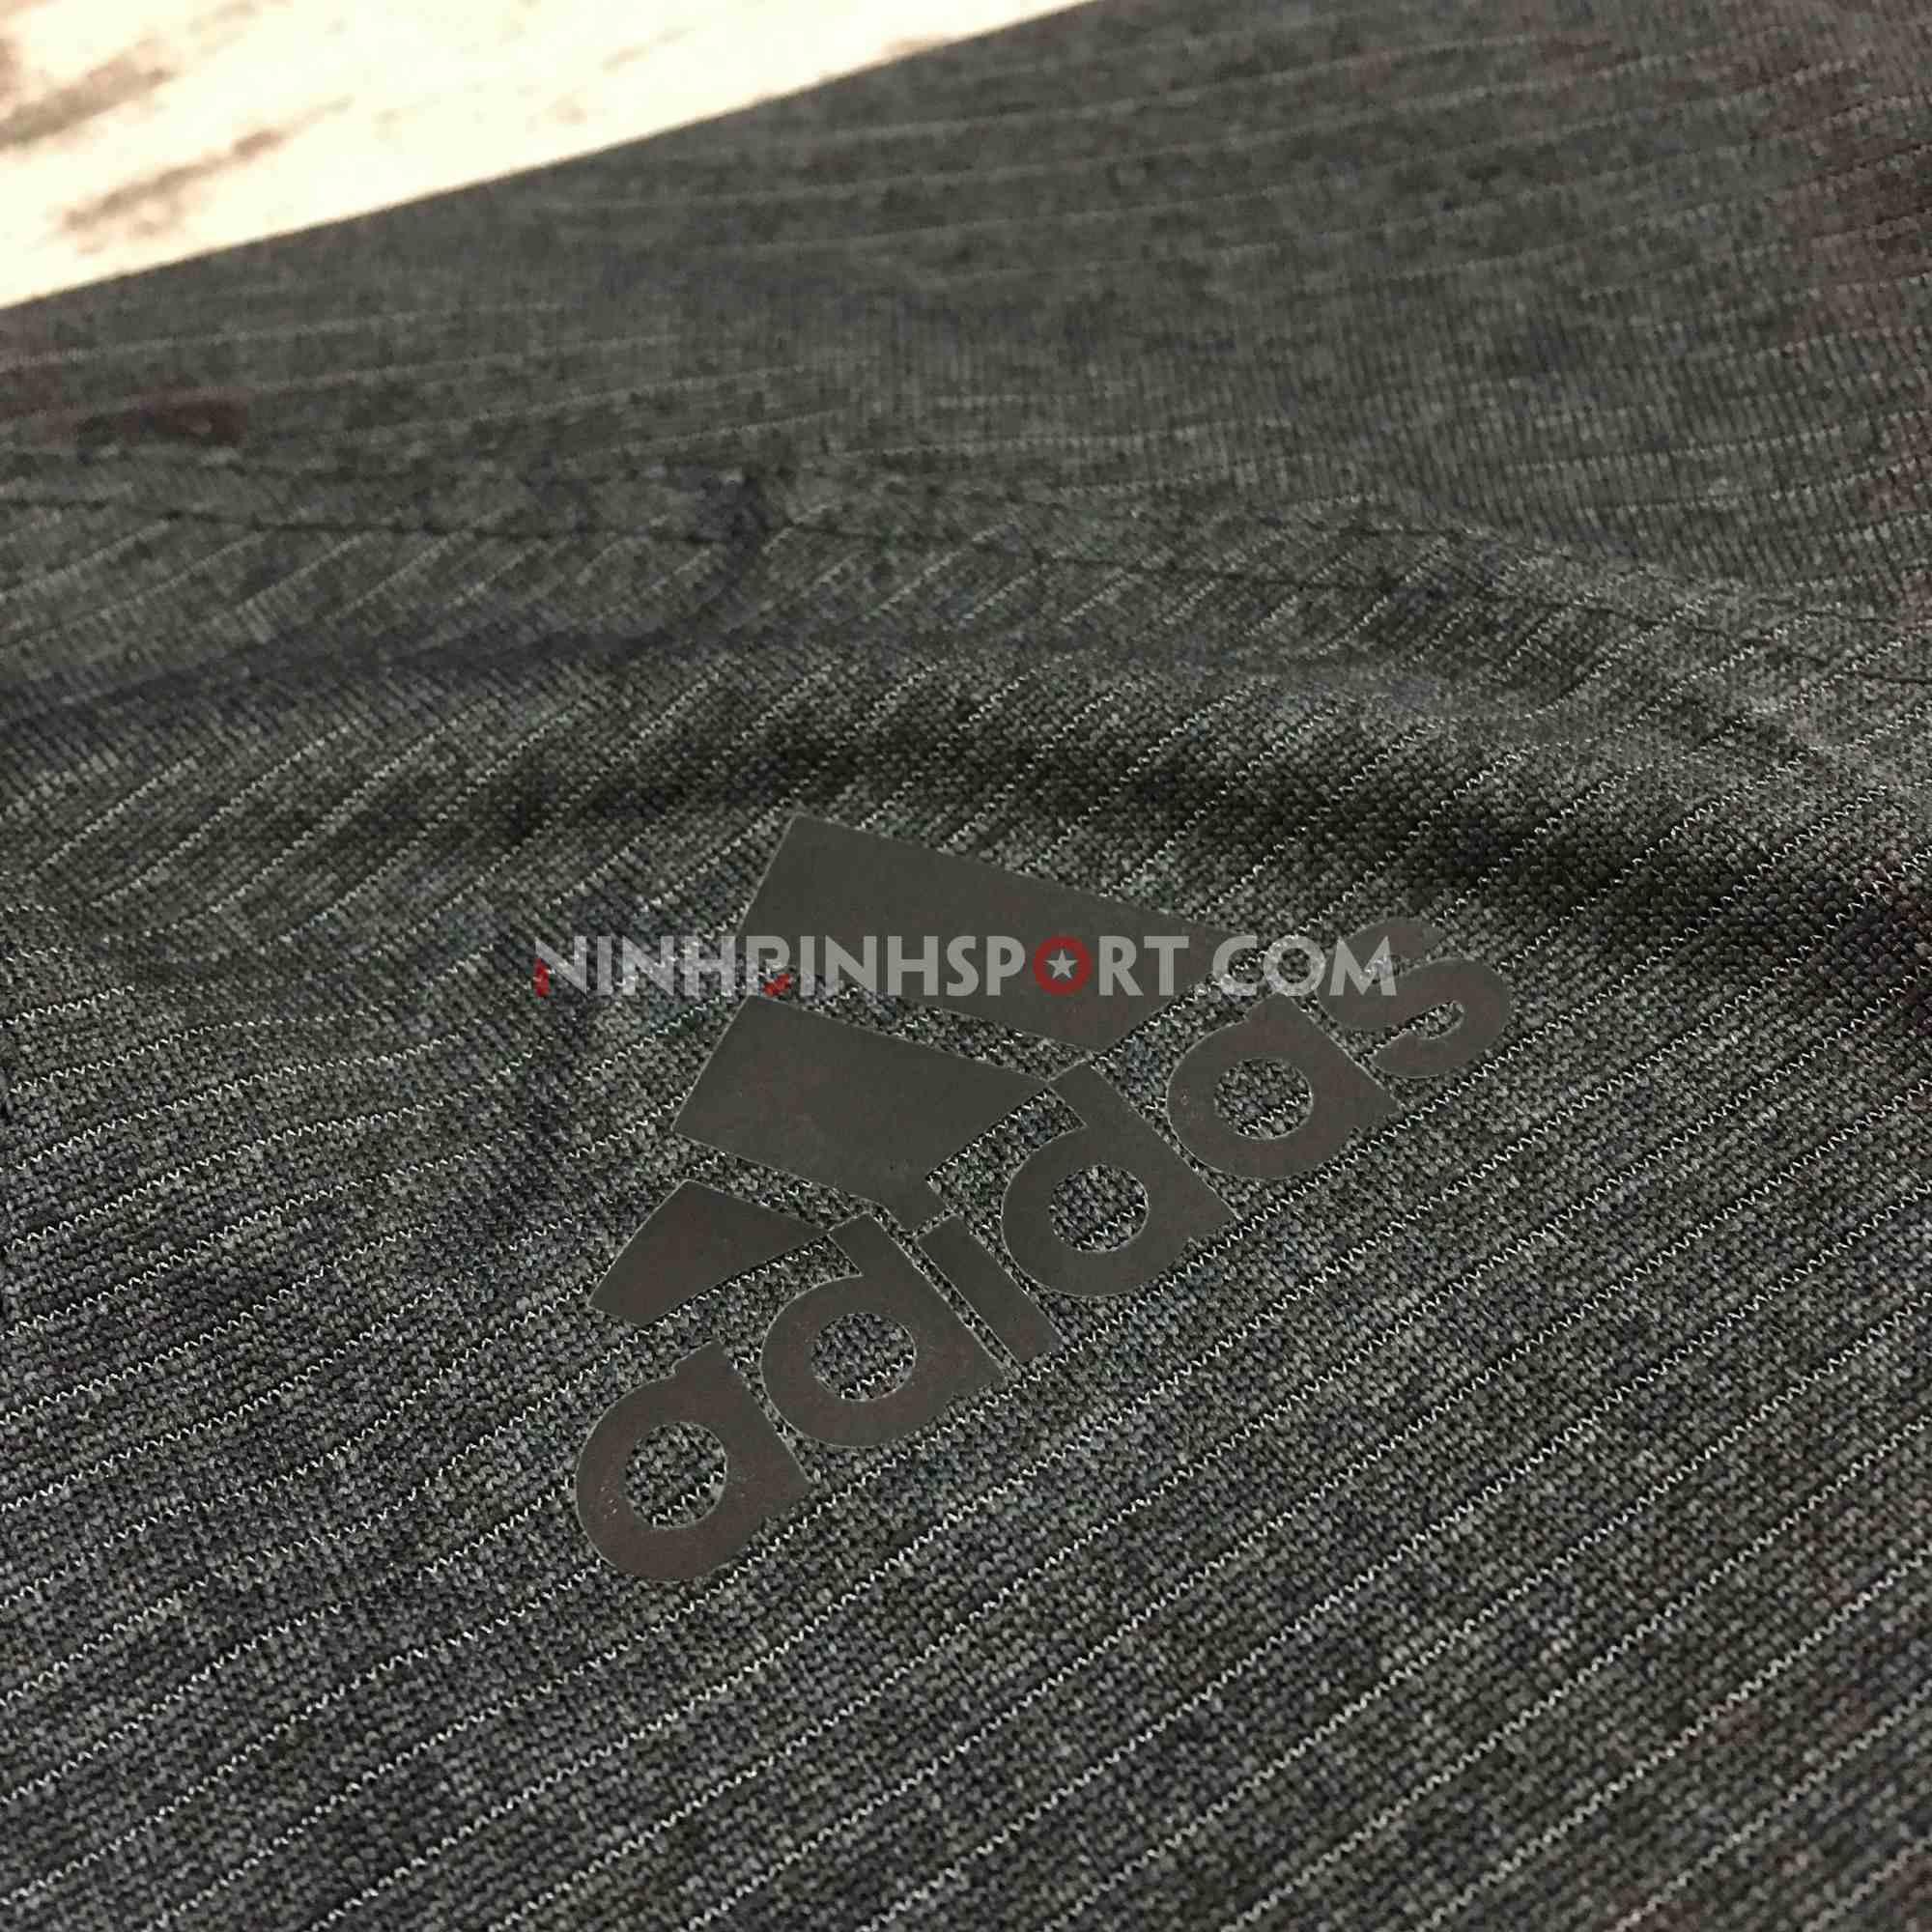 Áo thể thao nam Adidas FreeLift Tech Climacool 3-Stripes DU1485